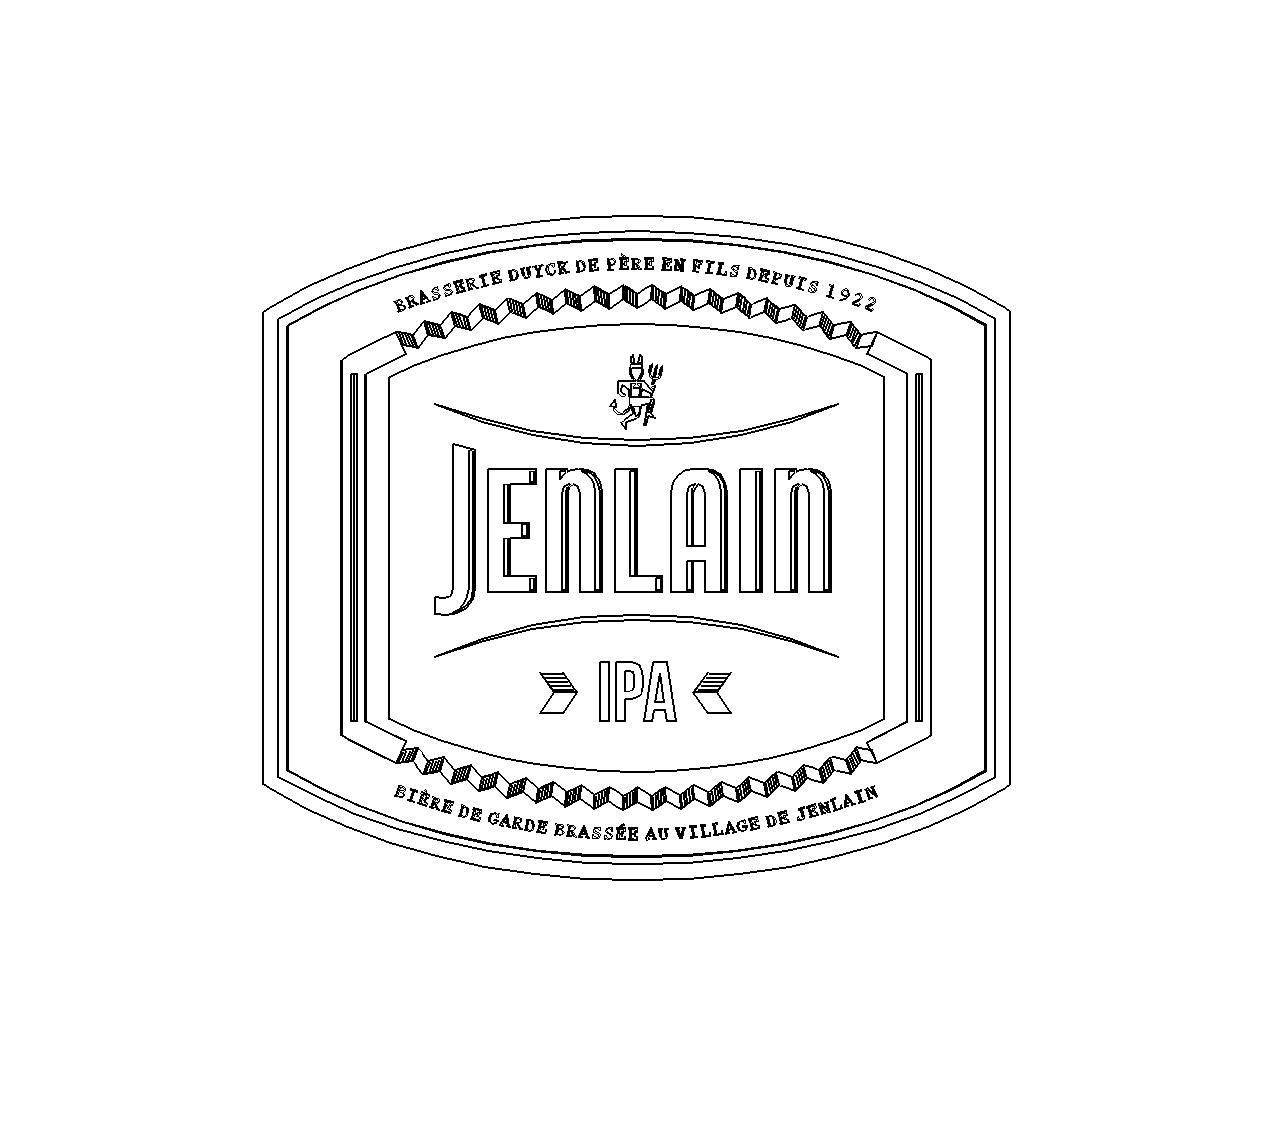 JENLAIN_degustation_etiquette.png